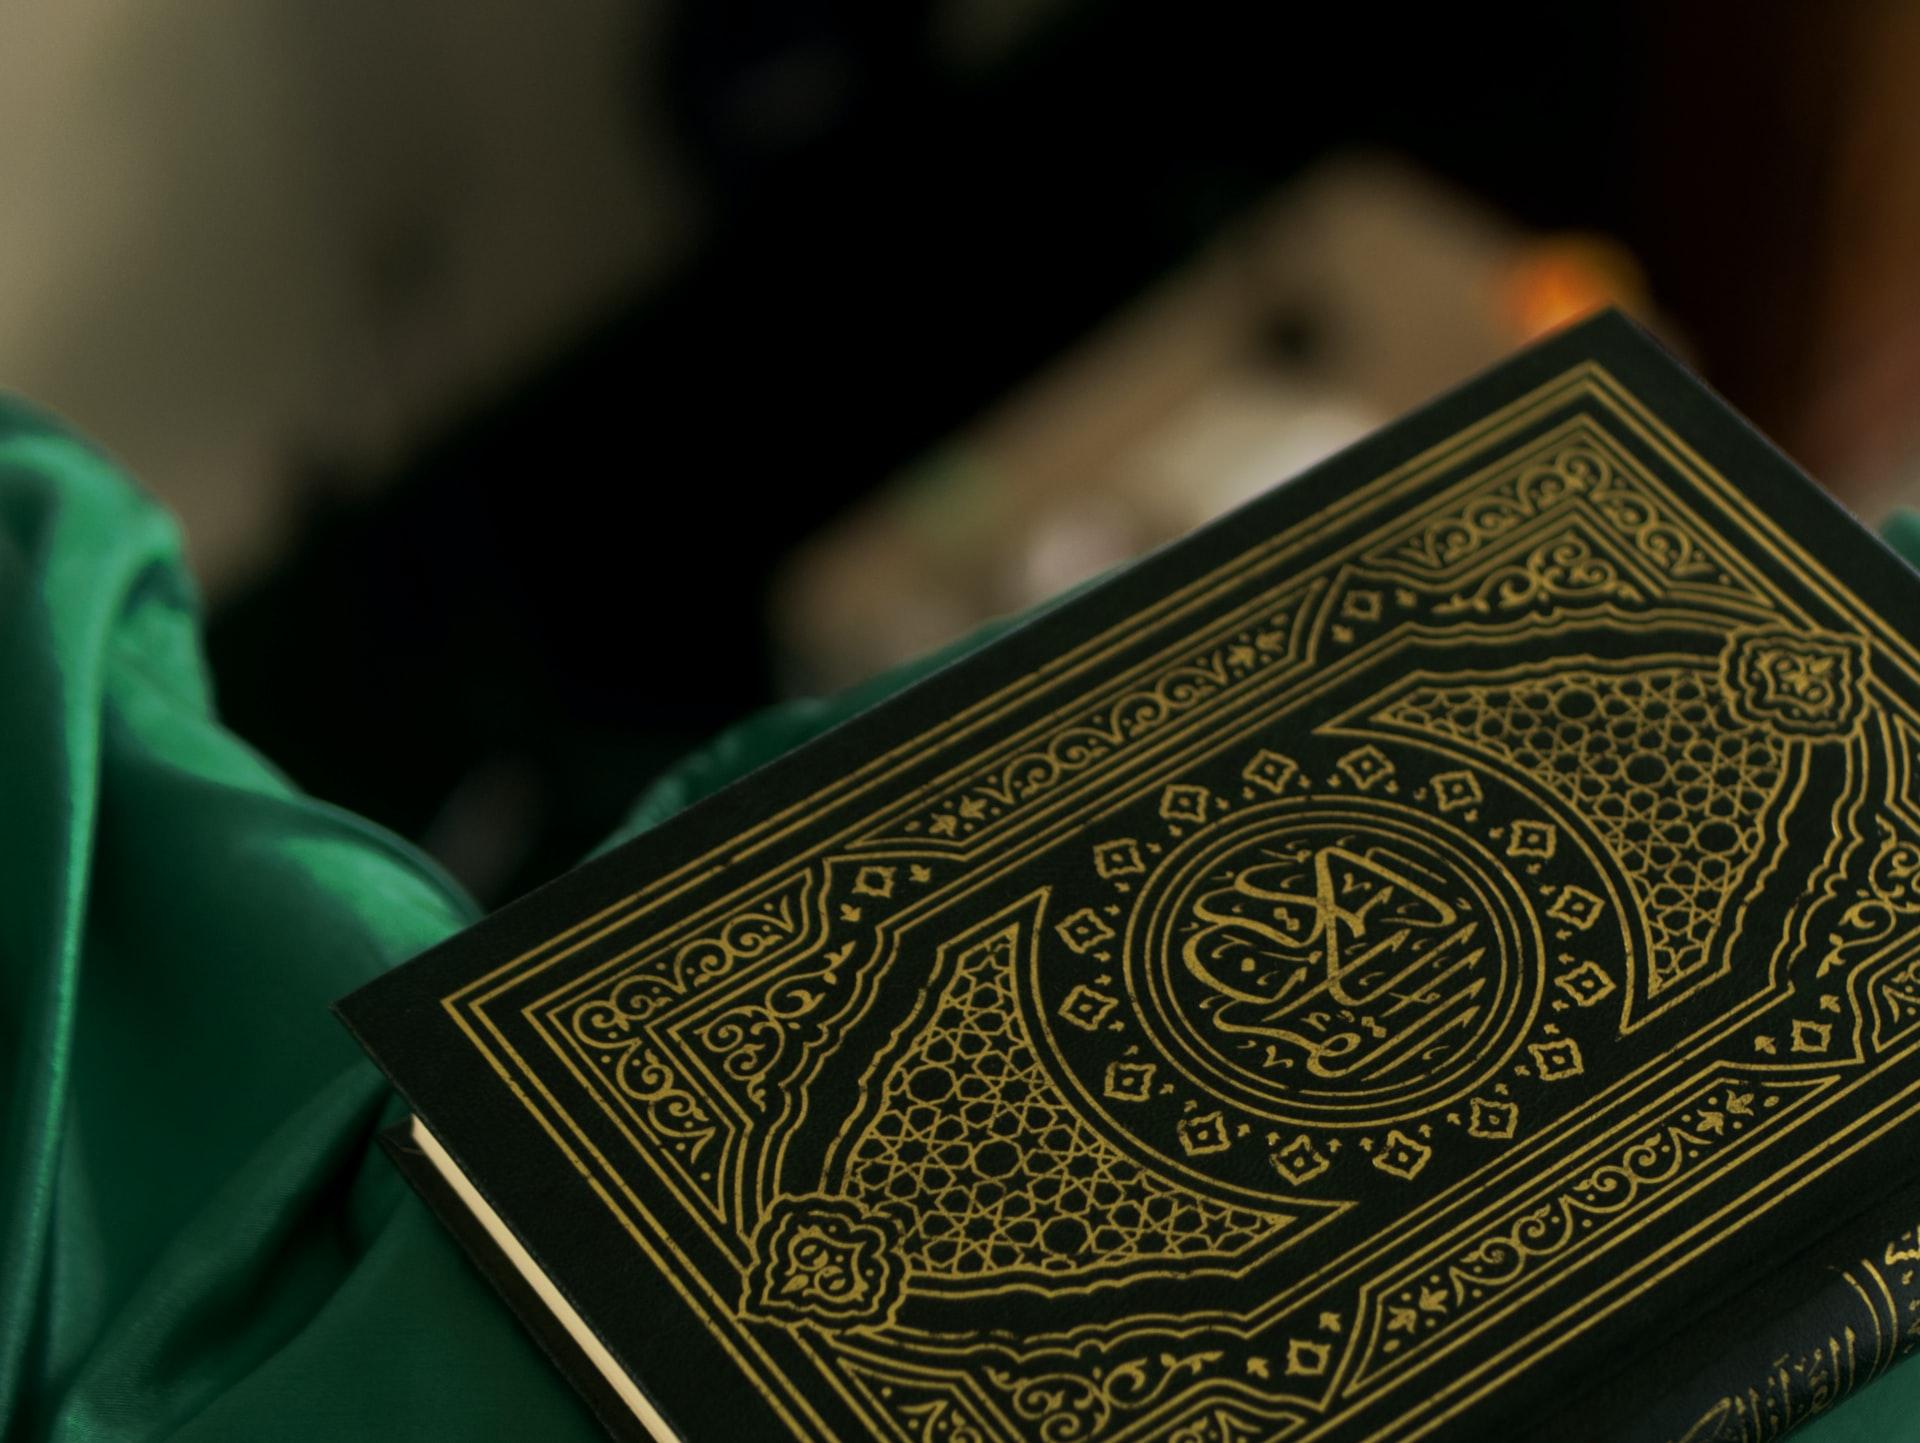 Tombe Musulmane